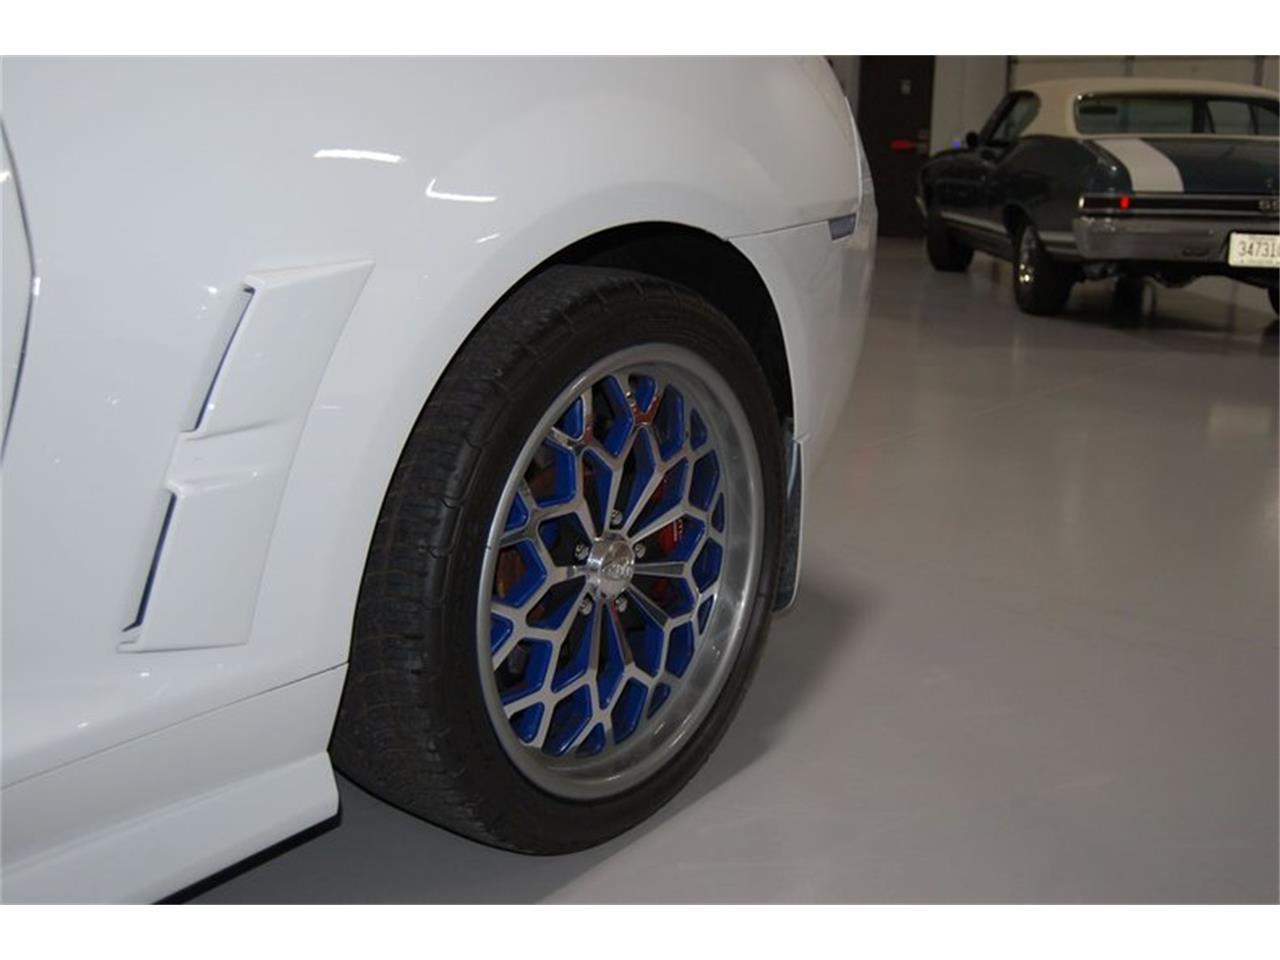 2014 Chevrolet Camaro (CC-1374129) for sale in Rogers, Minnesota